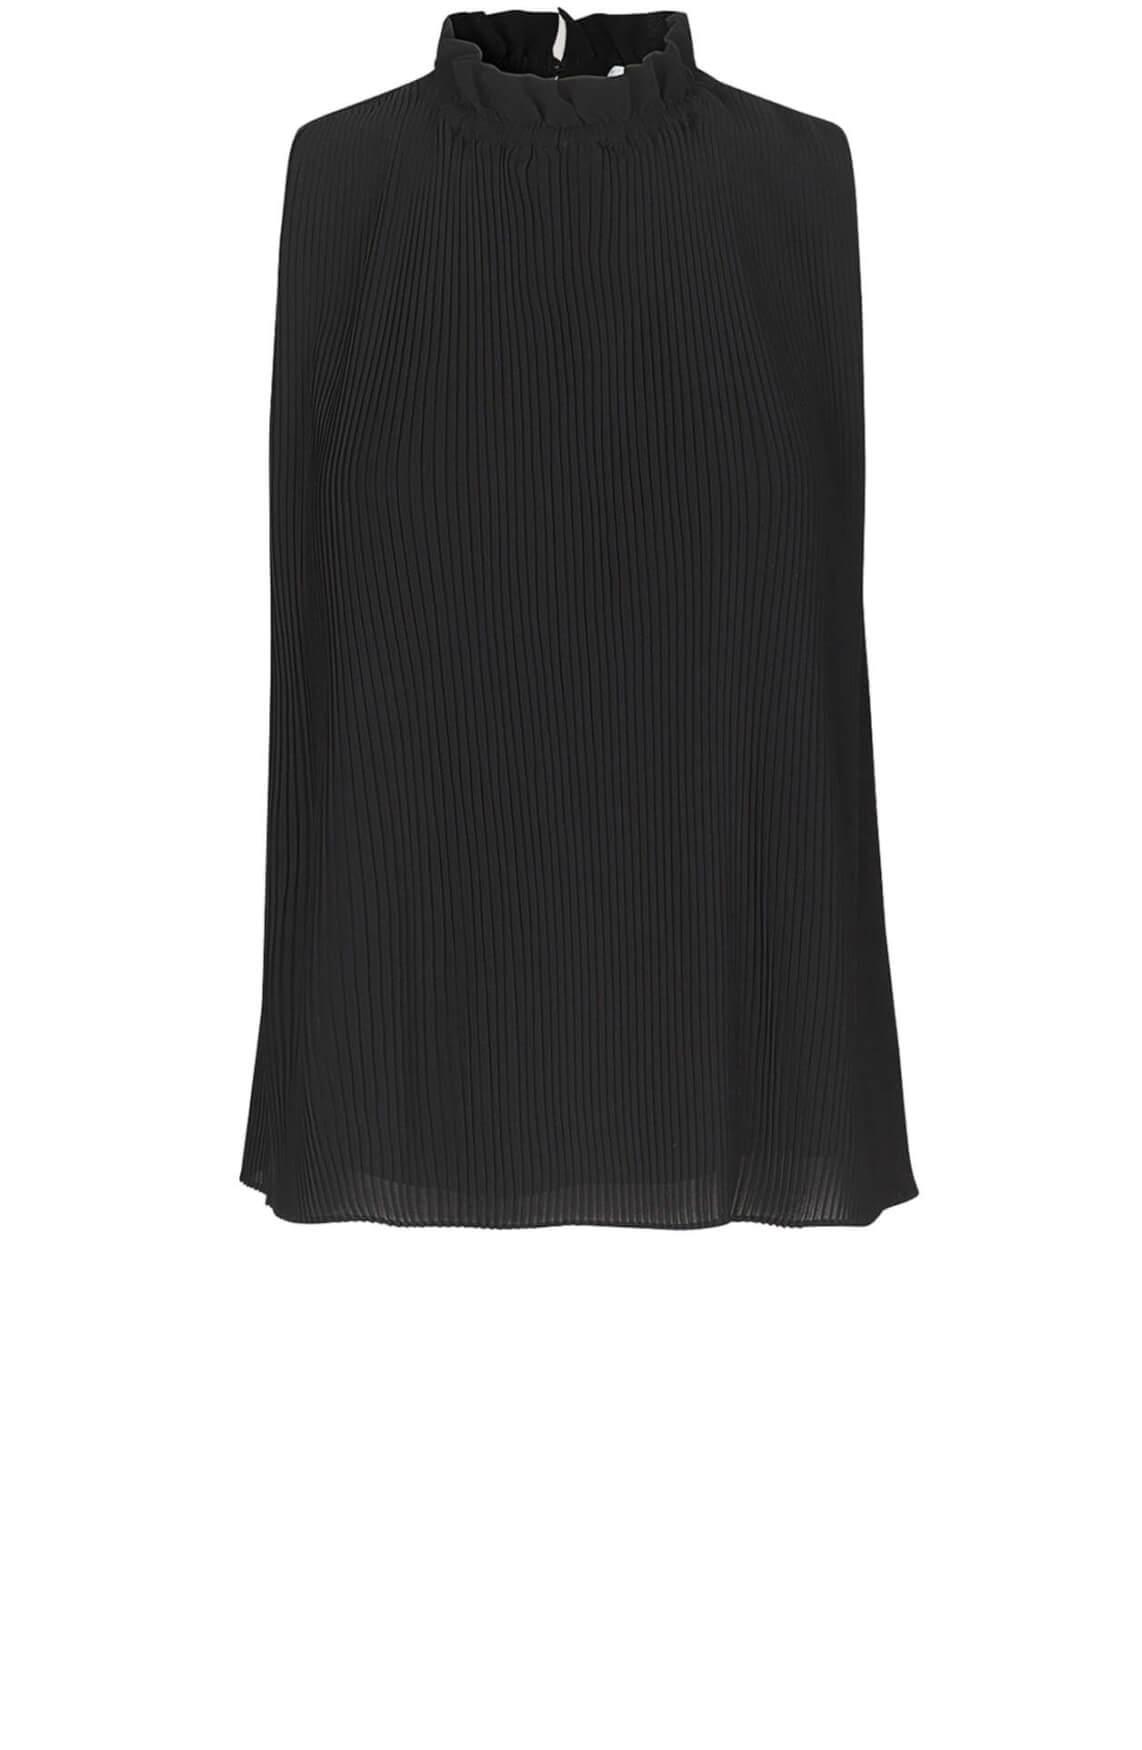 Samsoe Samsoe Dames Malie plissé blouse zwart